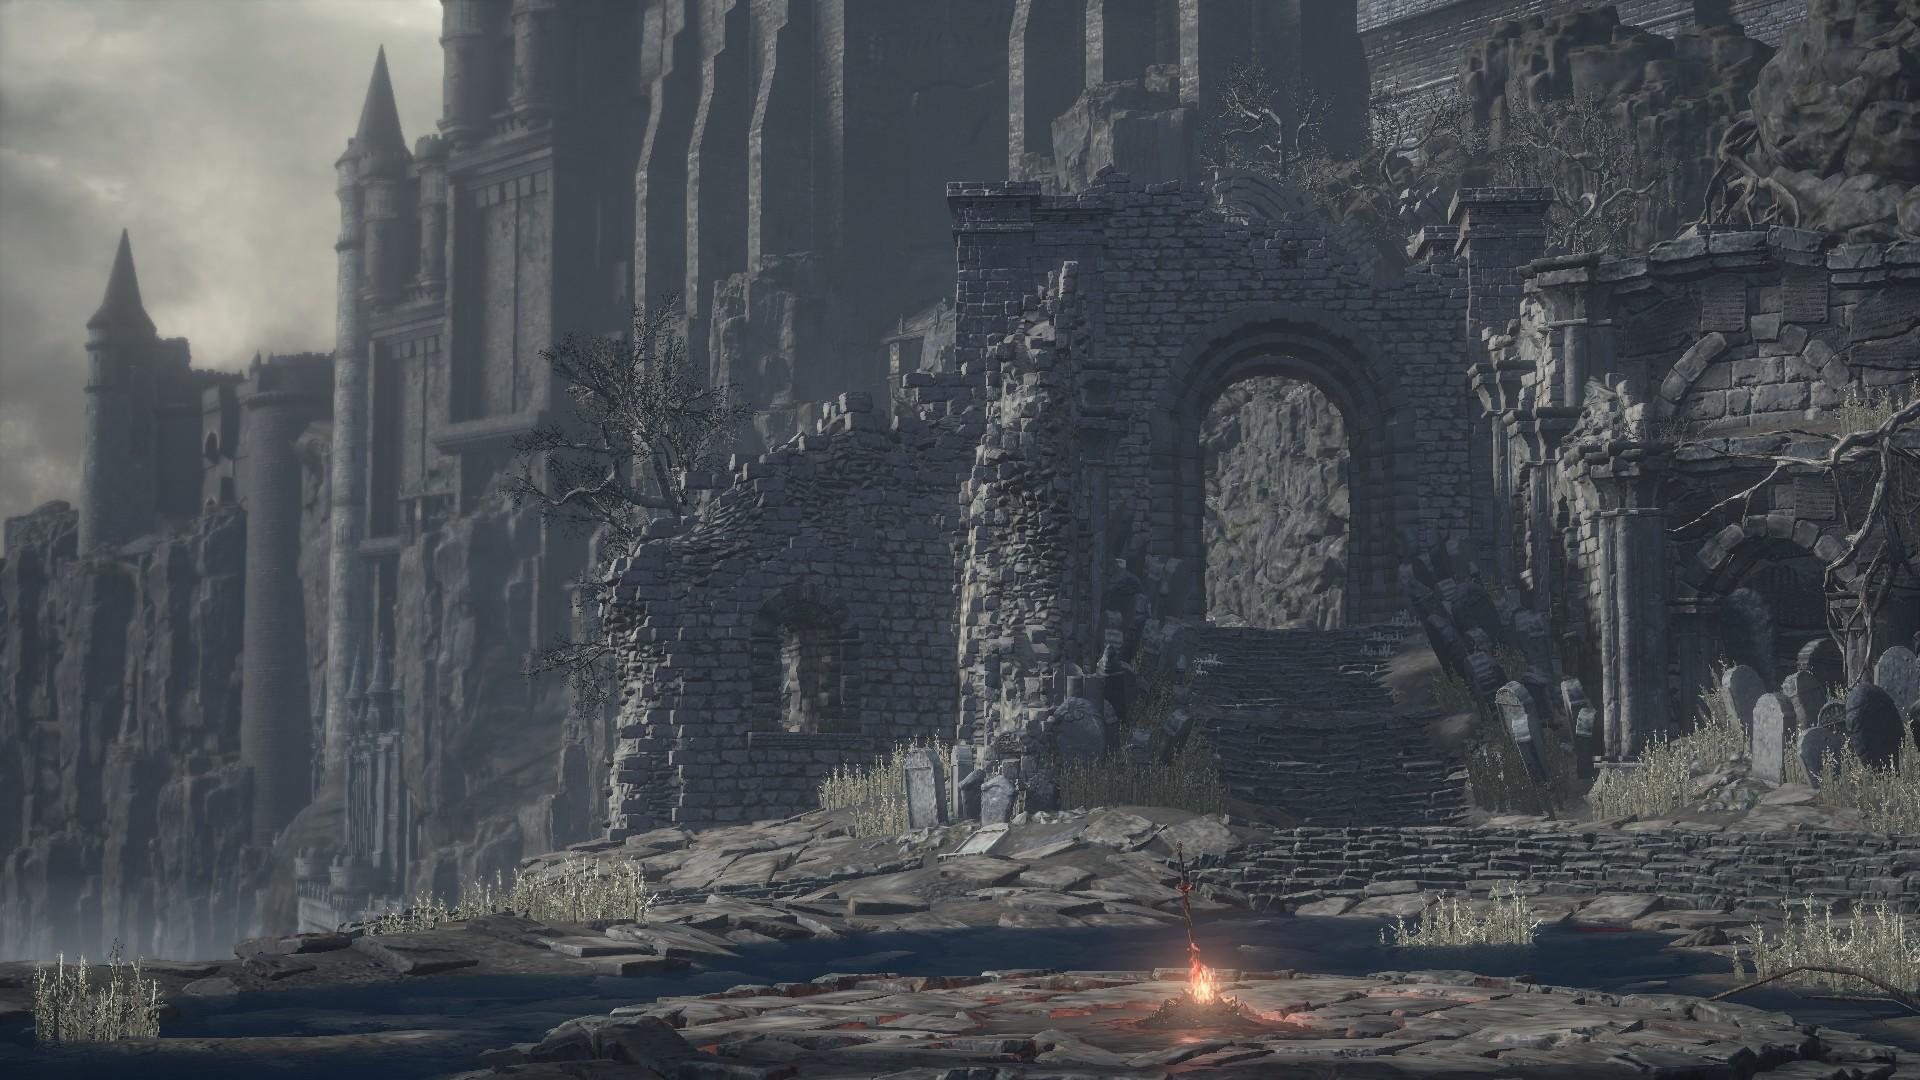 Dark Souls III: A Lesson In Immersive Worldbuilding